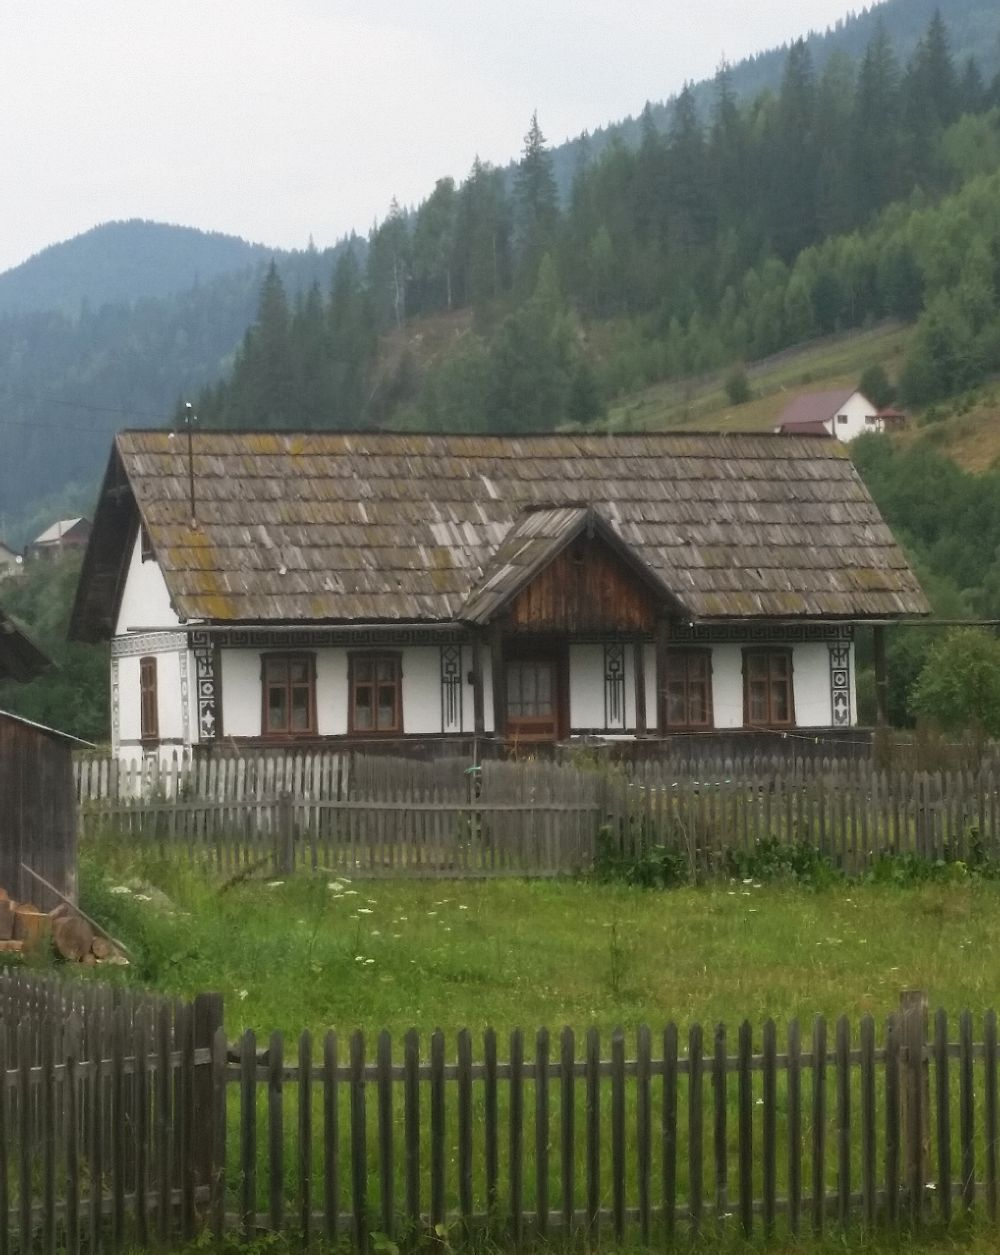 adelaparvu.com despre Ciocanesti, case cu motive traditionale, Bucovina, Romania (55)